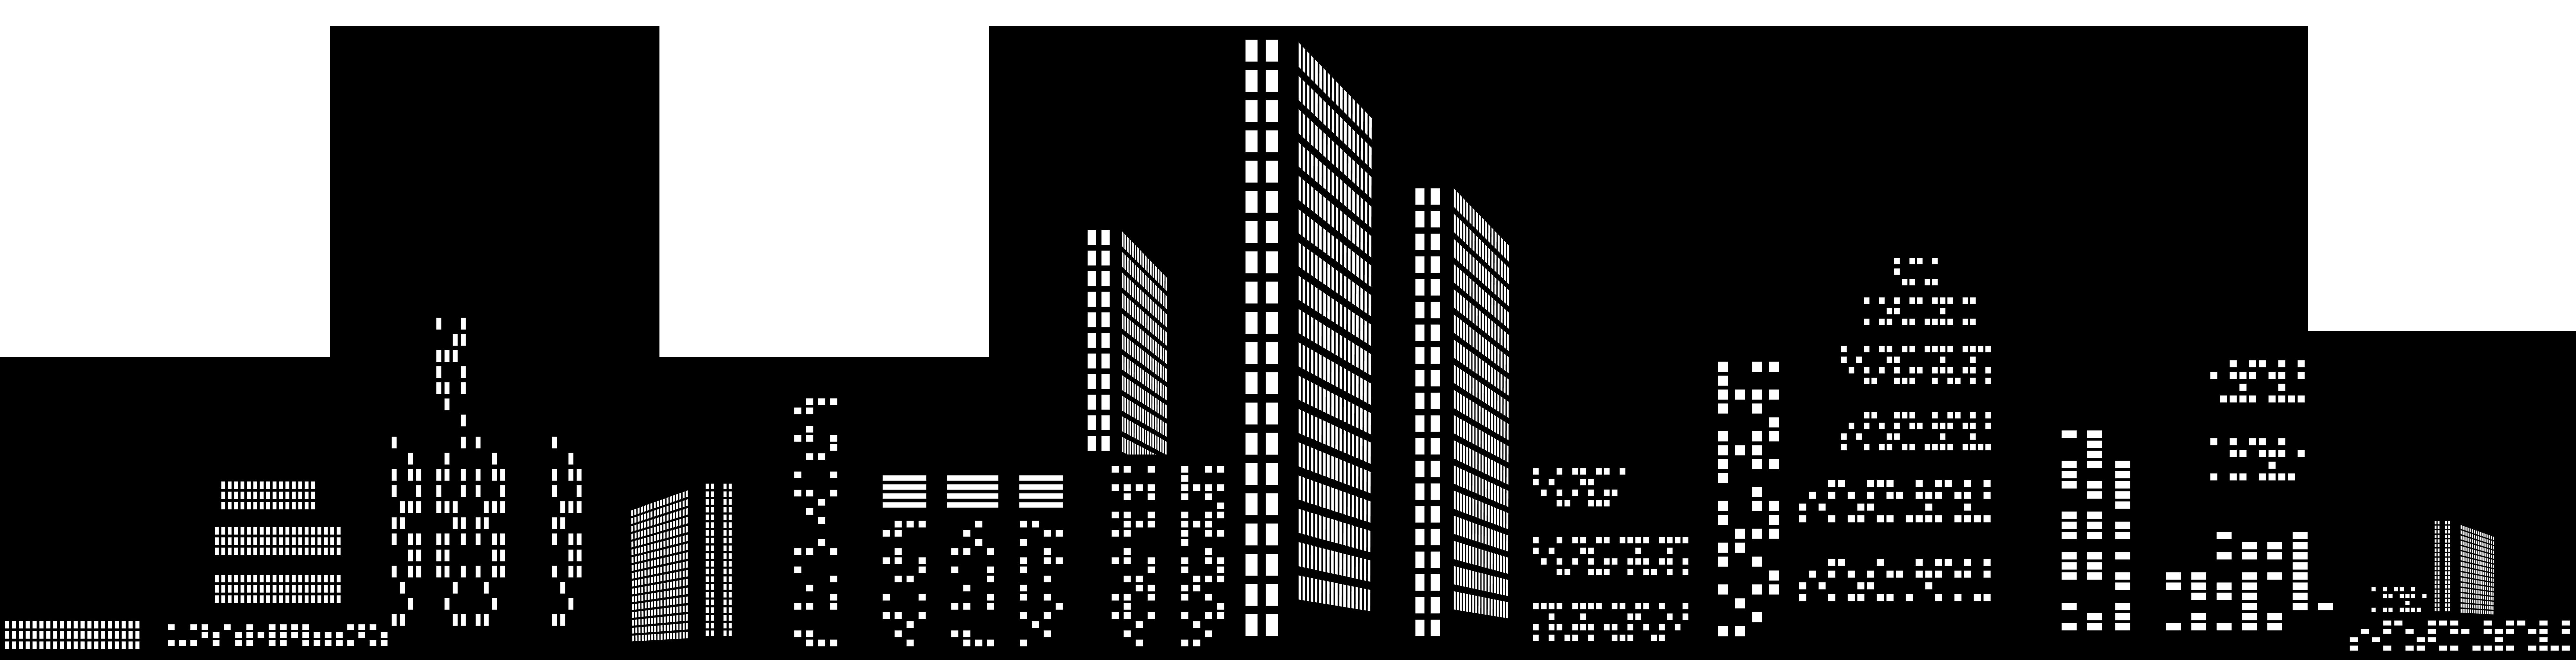 clipart free stock Building clipart skyline. Cityscape silhouette clip art.